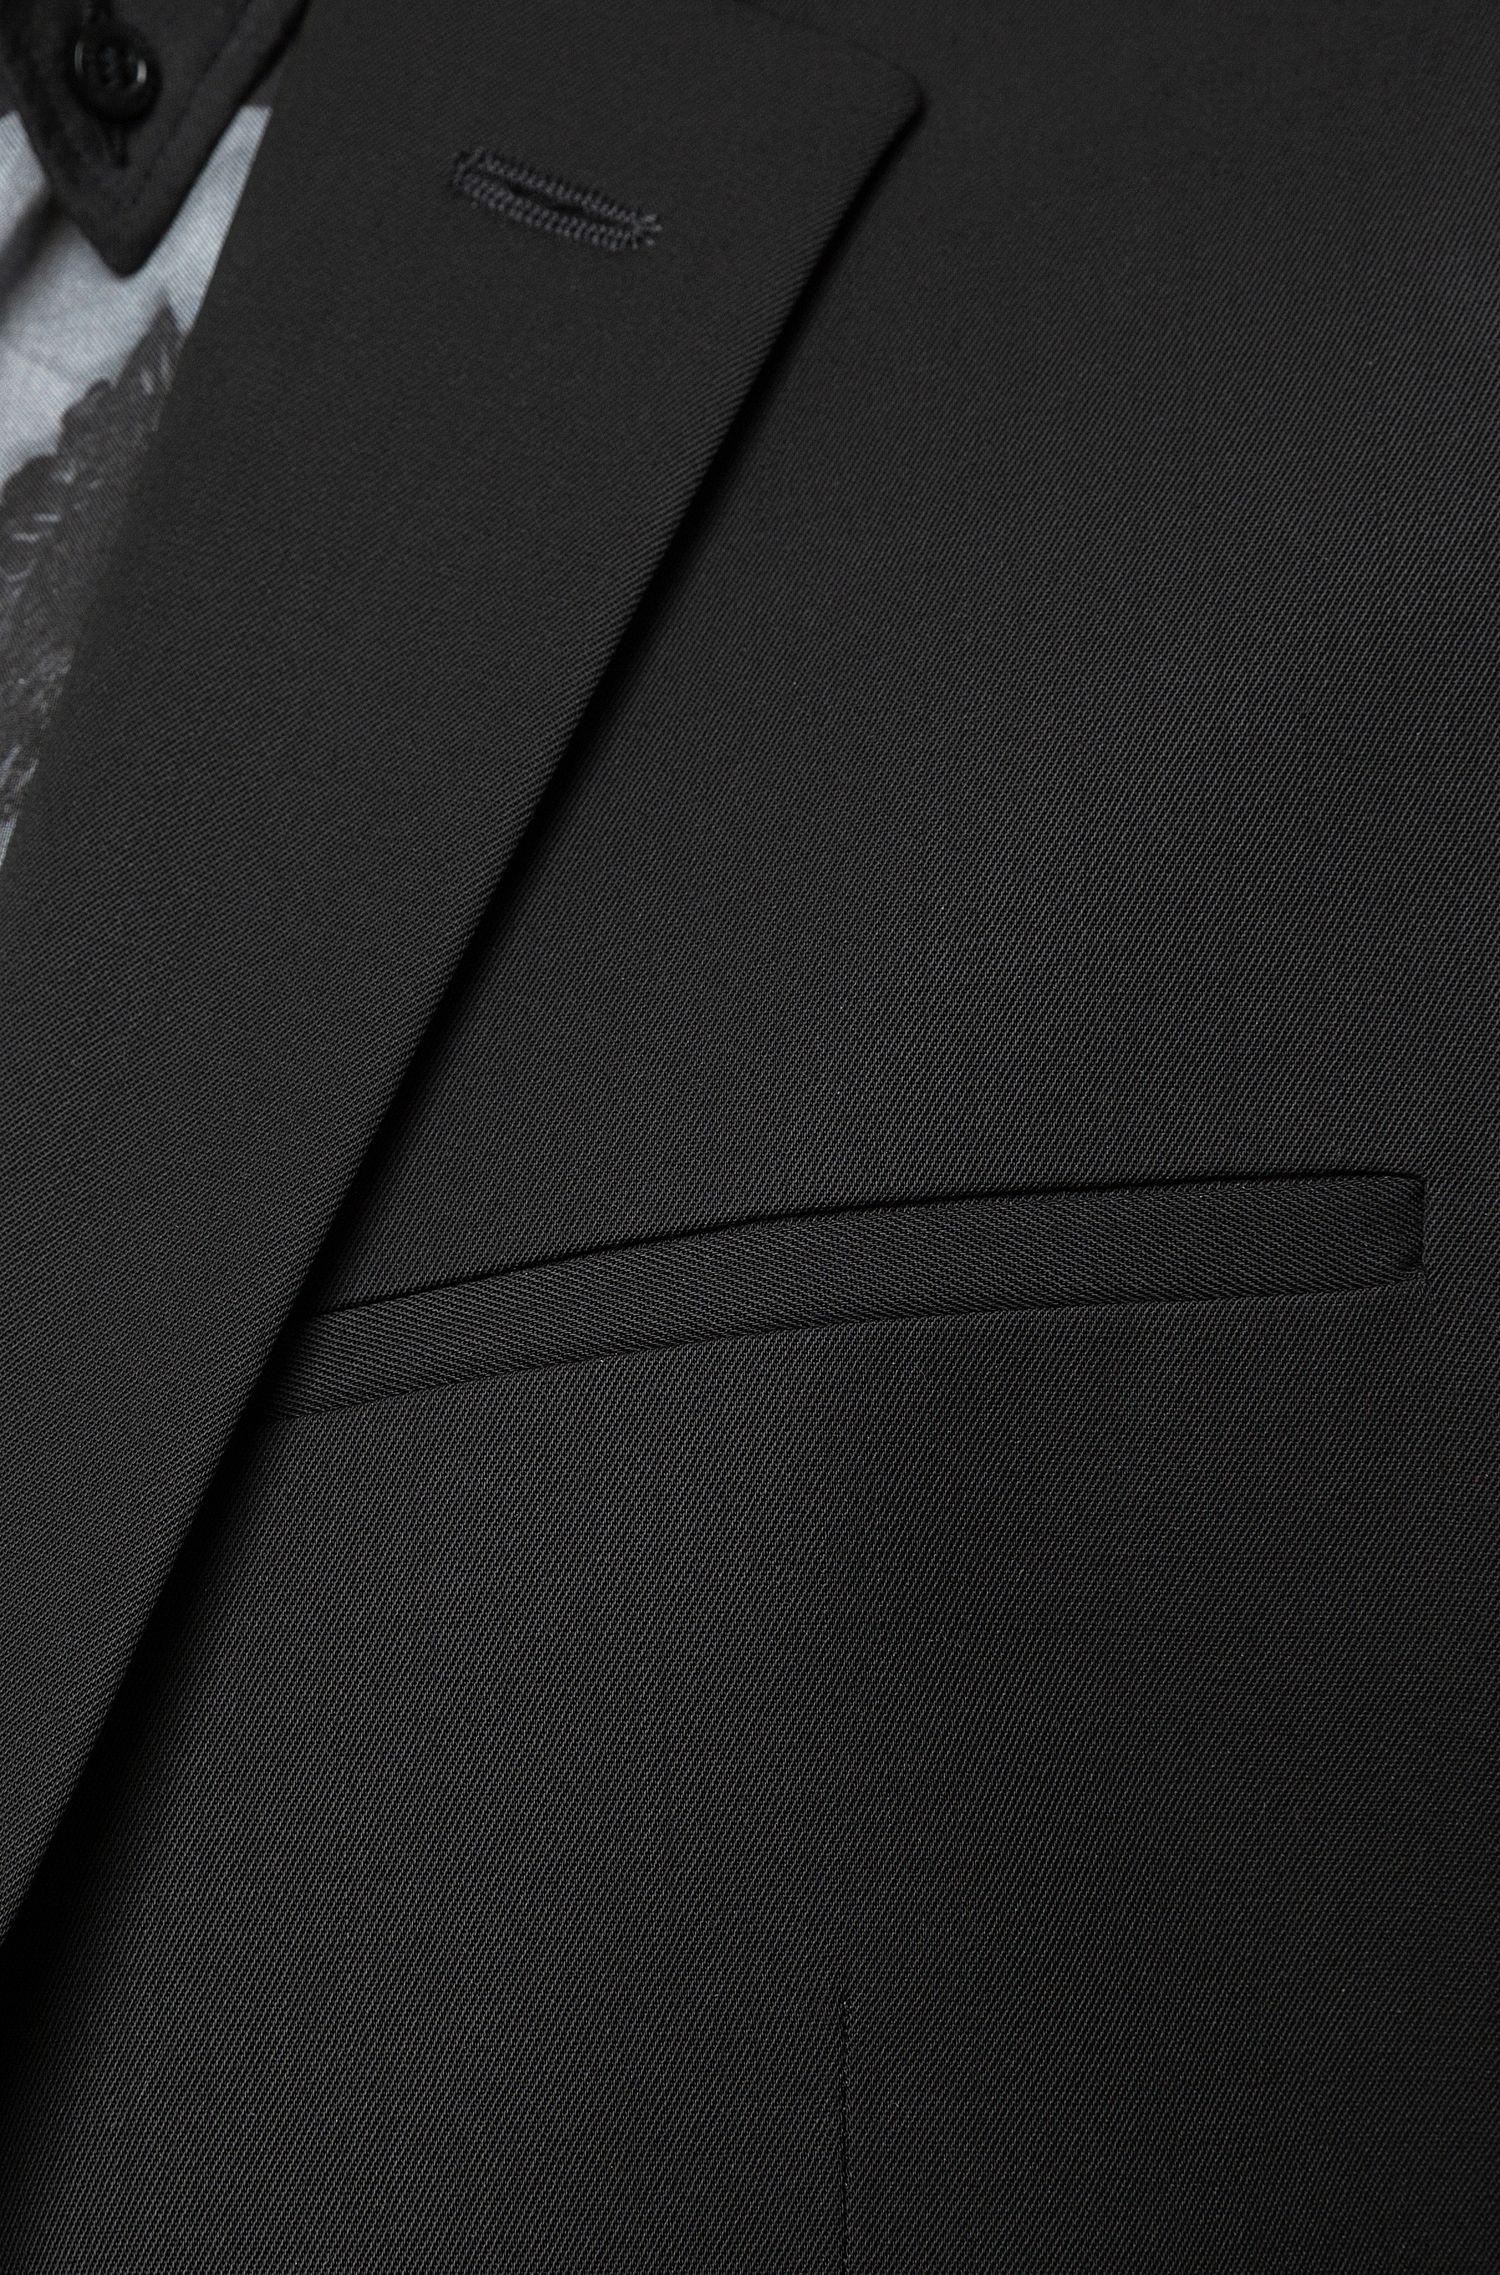 Traje plegable extra slim fit en sarga de lana virgen, Negro